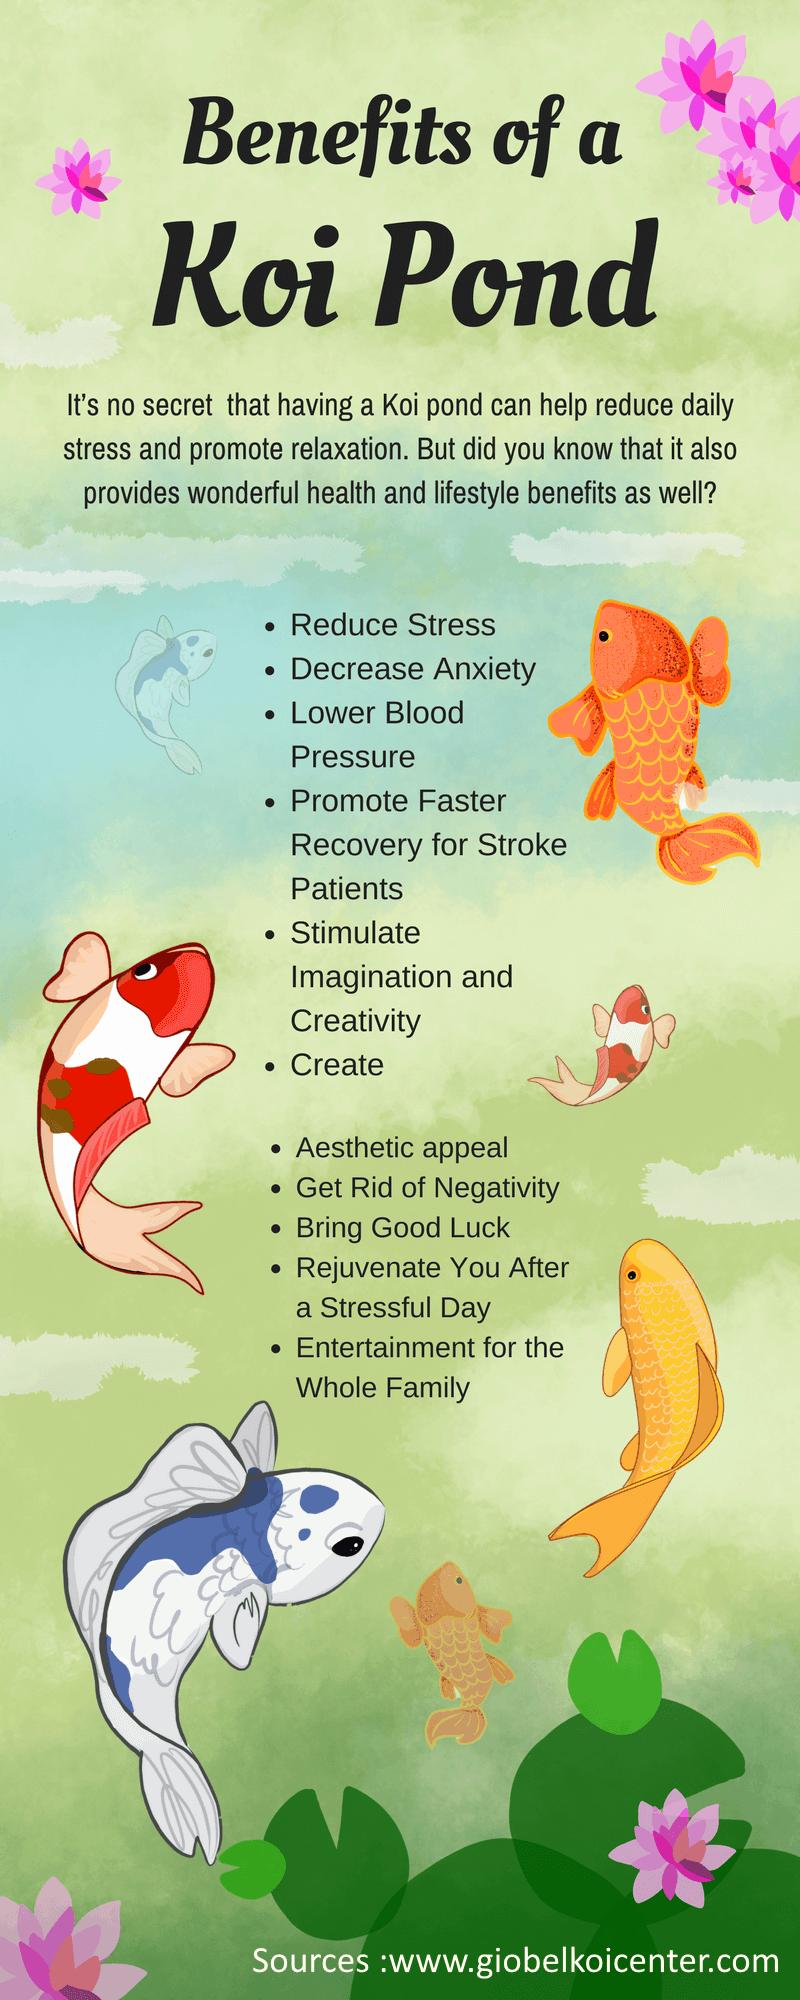 Koi Fish Therapeutic Effects Koi Koifish Koipond Koifishtattoo Koifishinformation Koifishponds Koi Fish Care Koi Fish Koi